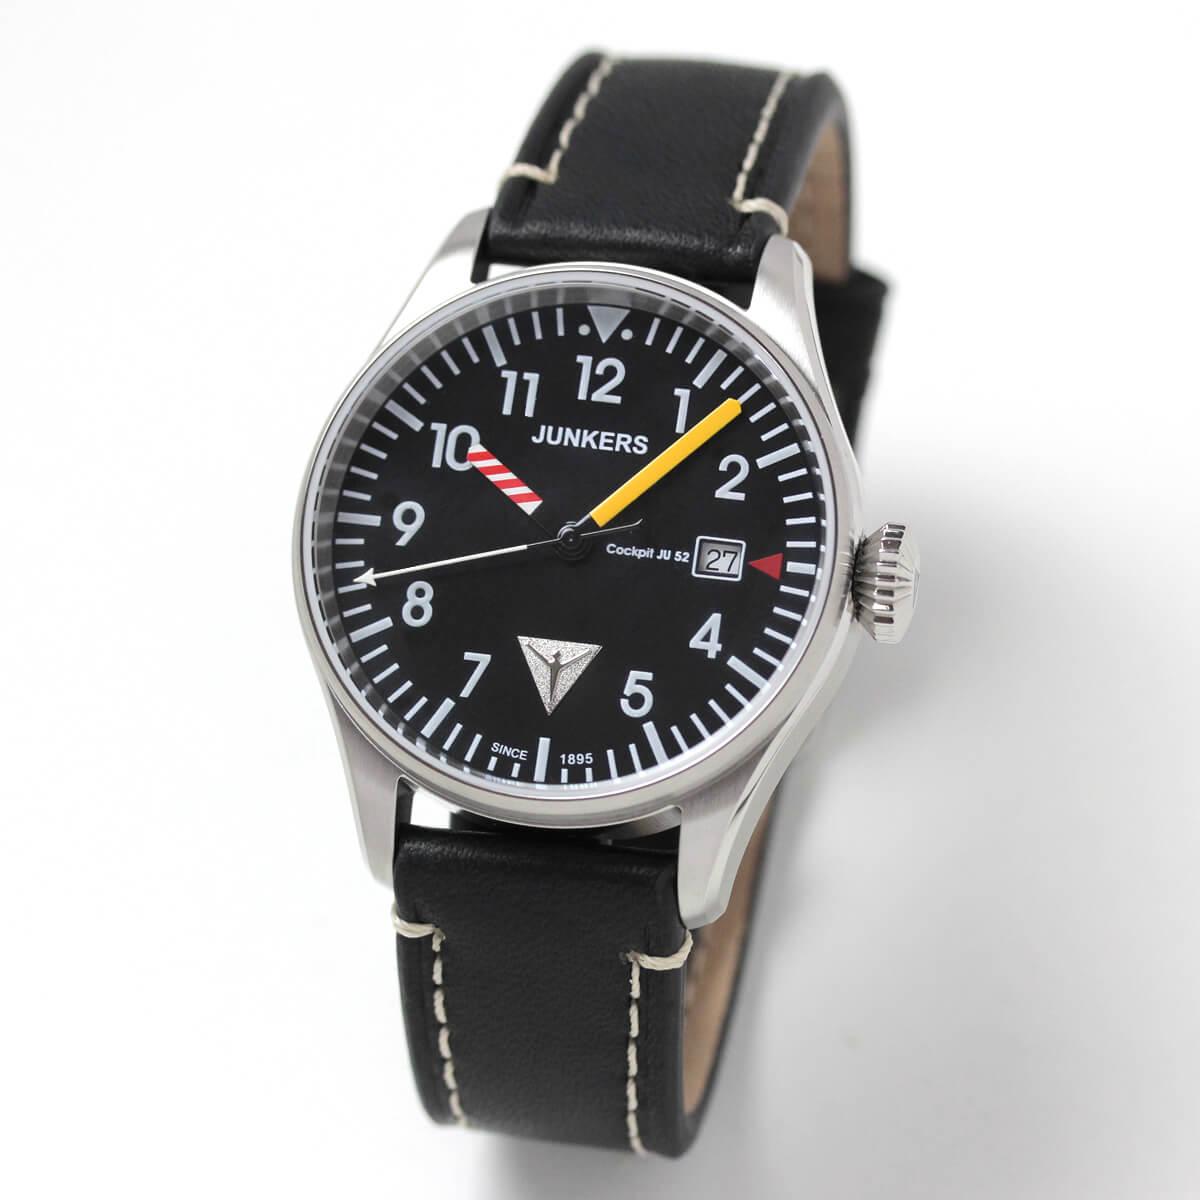 JUNKERS(ユンカース)/Cockpit JU52/クォーツ/6144-3qz-203552/腕時計